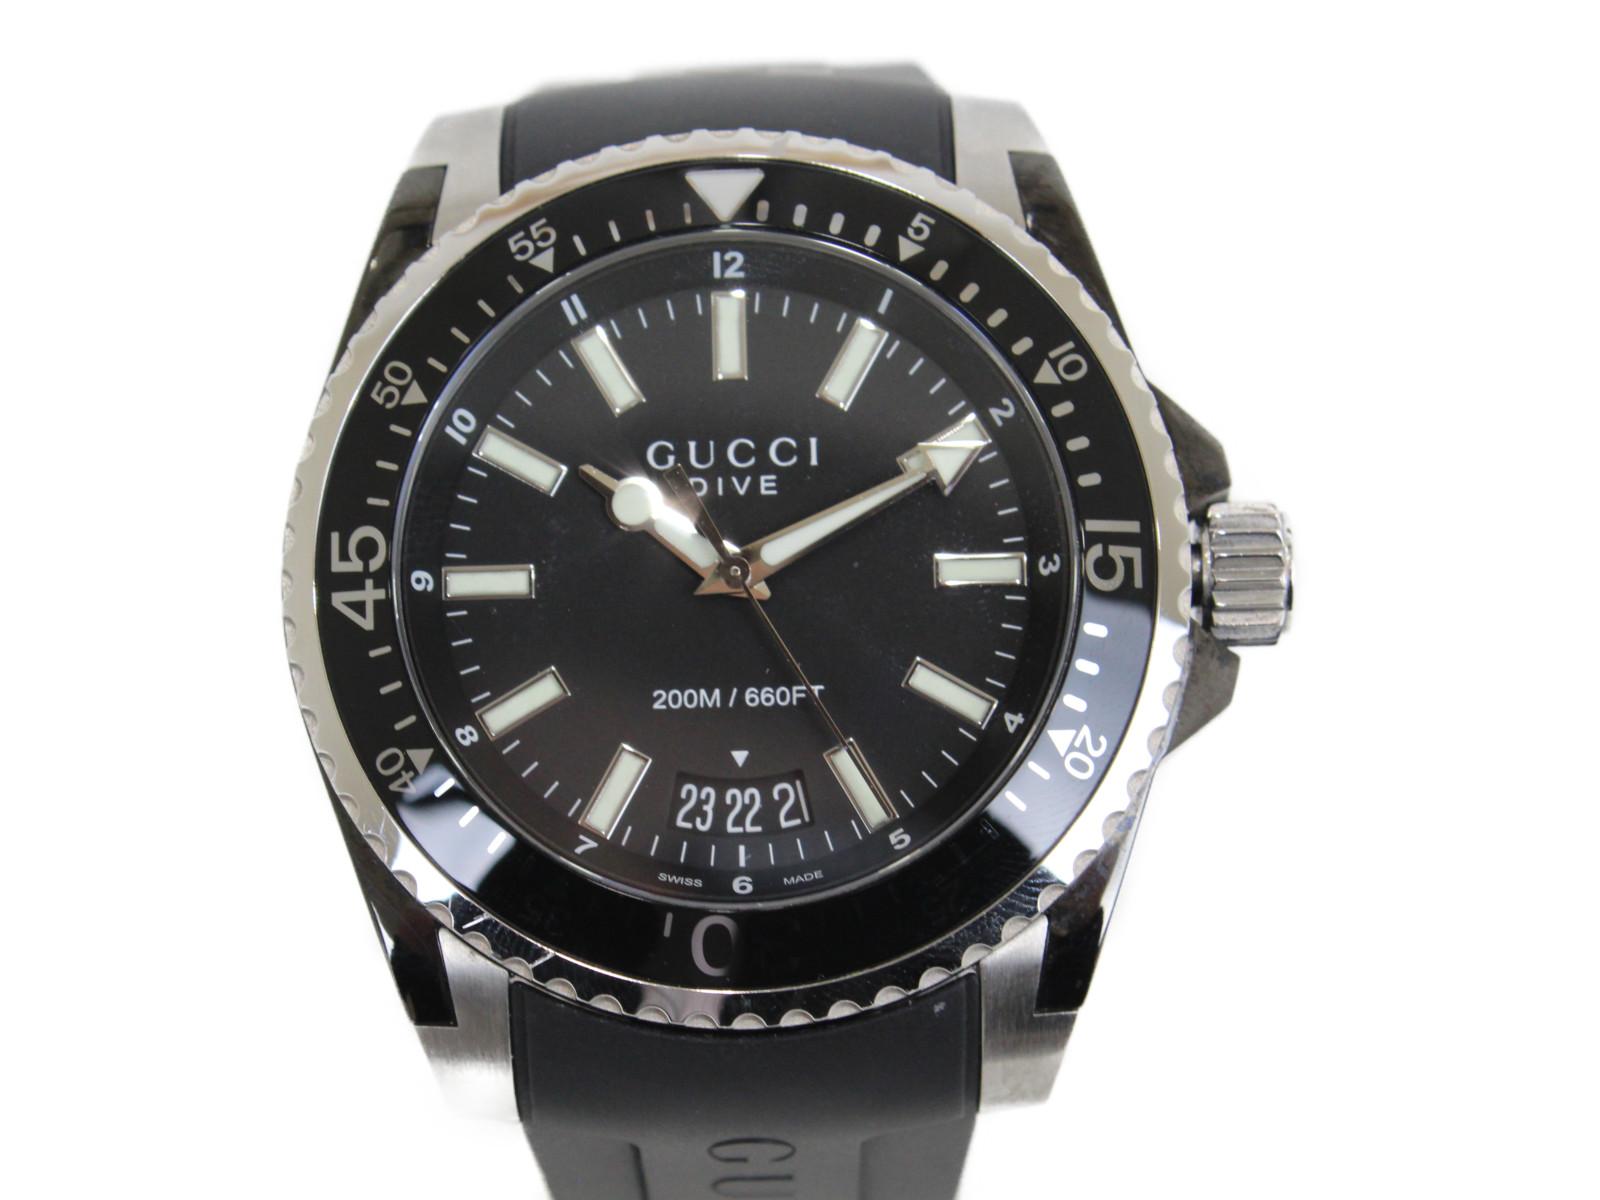 GUCCI グッチ グッチダイブ YA136204 クオーツ デイト表示 ラバーストラップ ブラック メンズ 腕時計 おしゃれ 【中古】